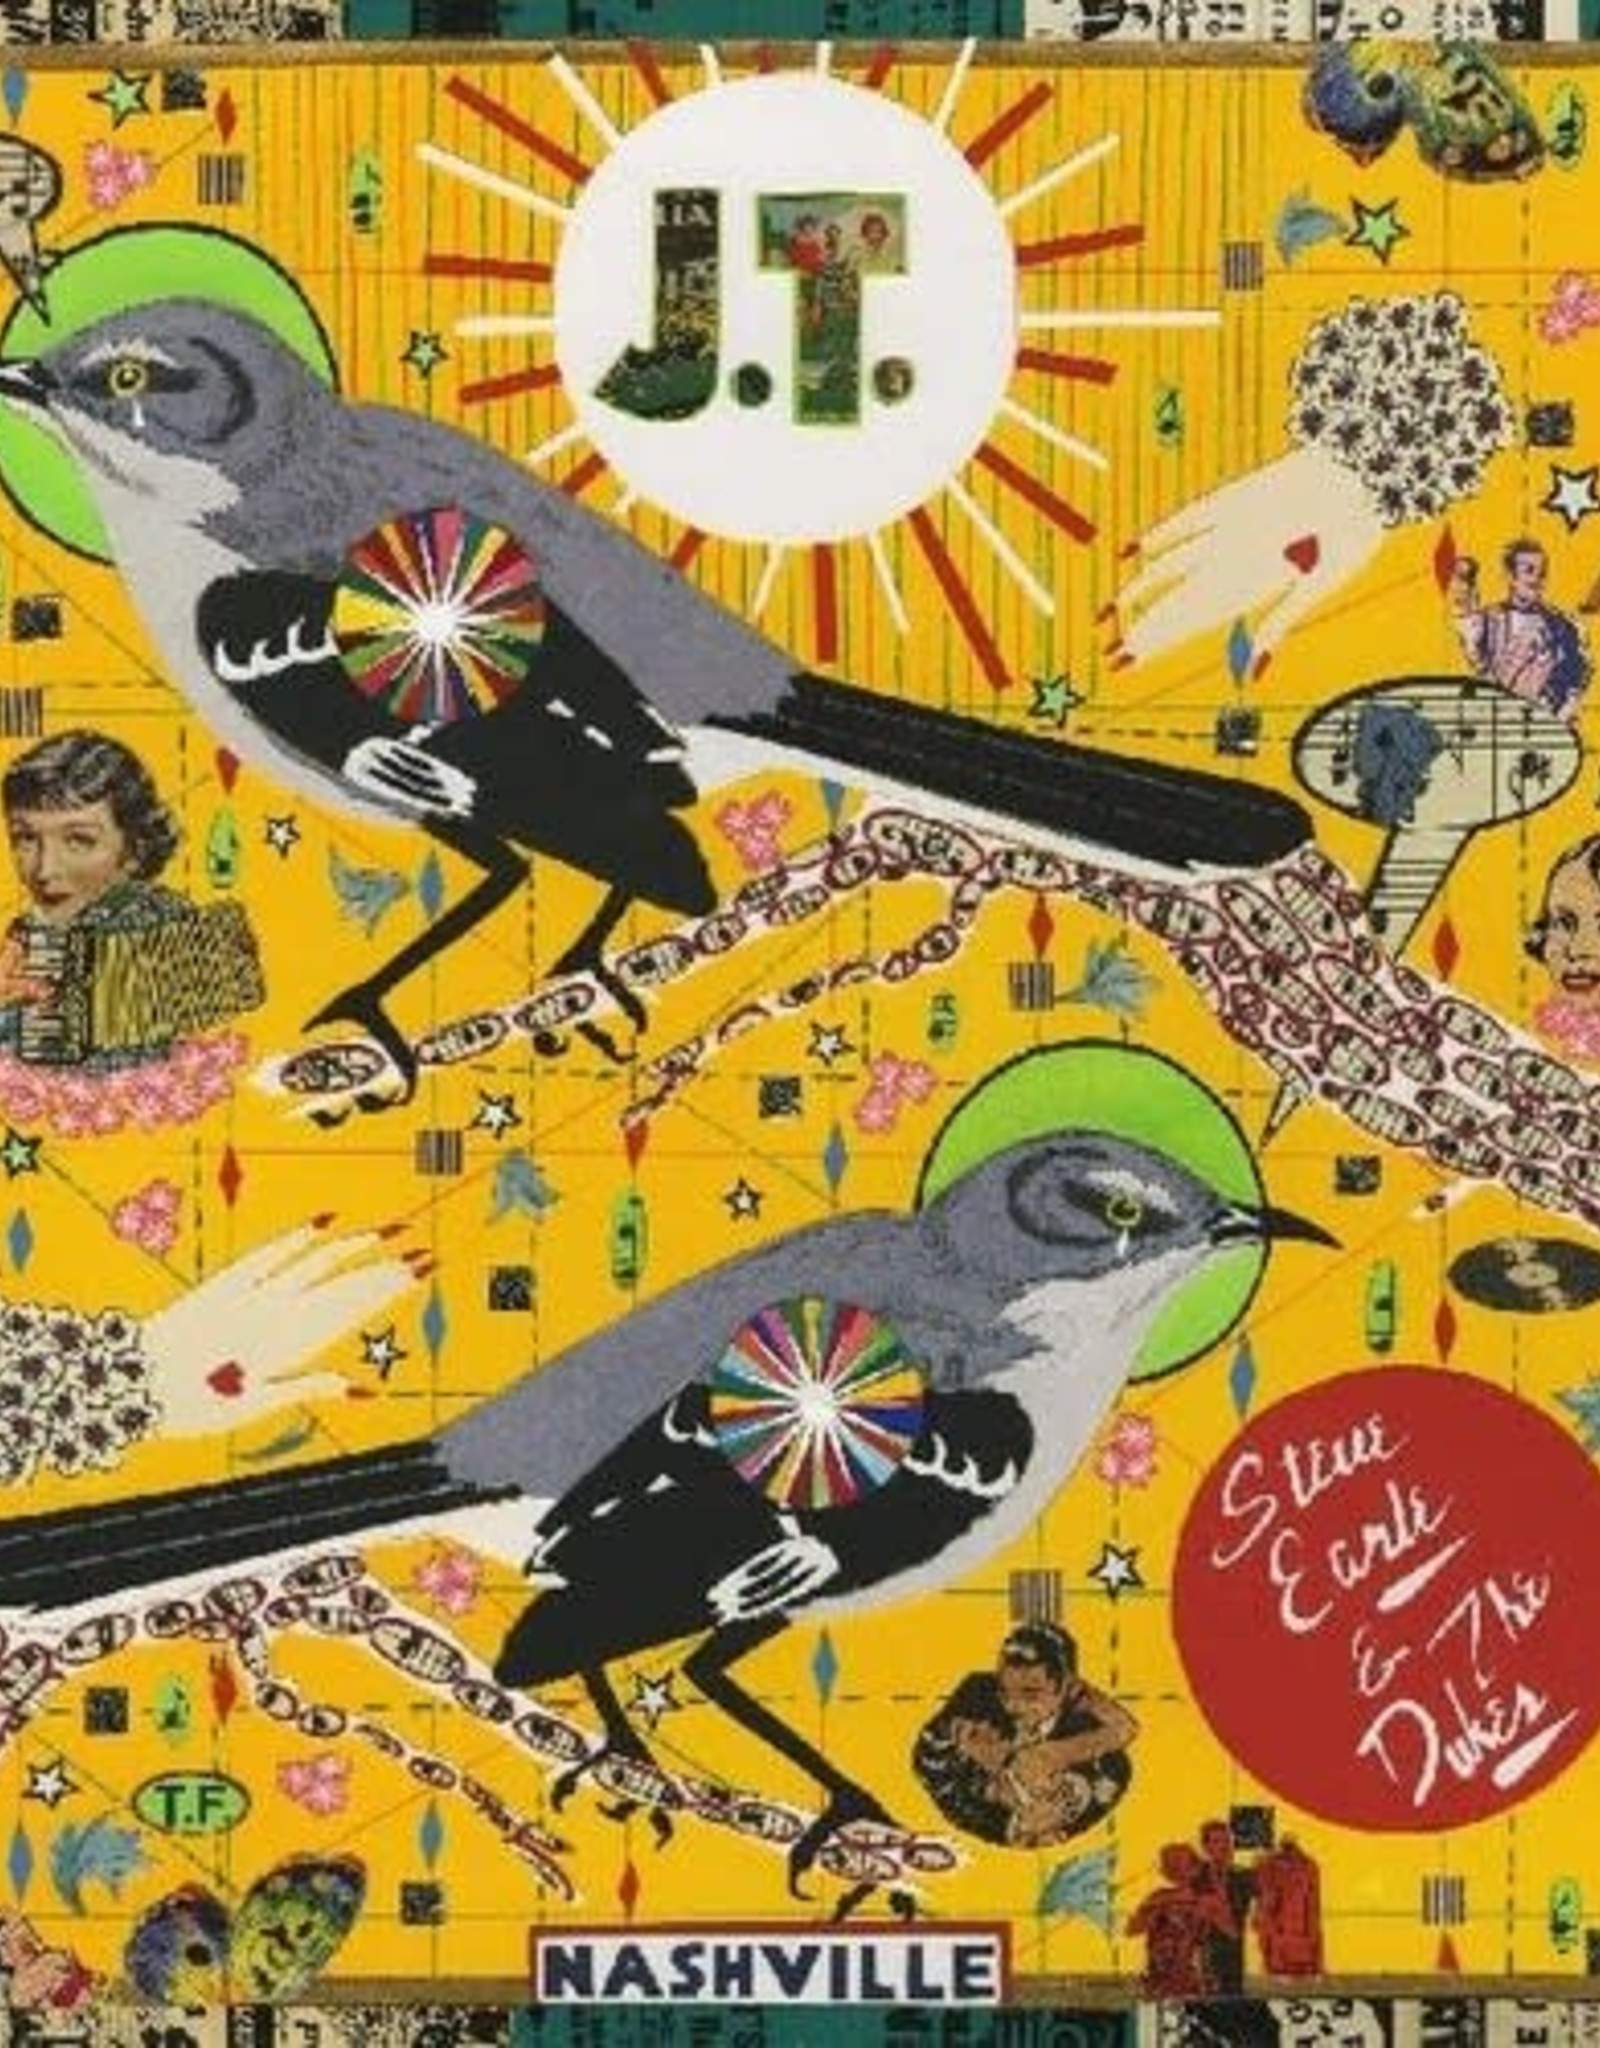 Steve Earle & the Dukes - J.T. (color vinyl)